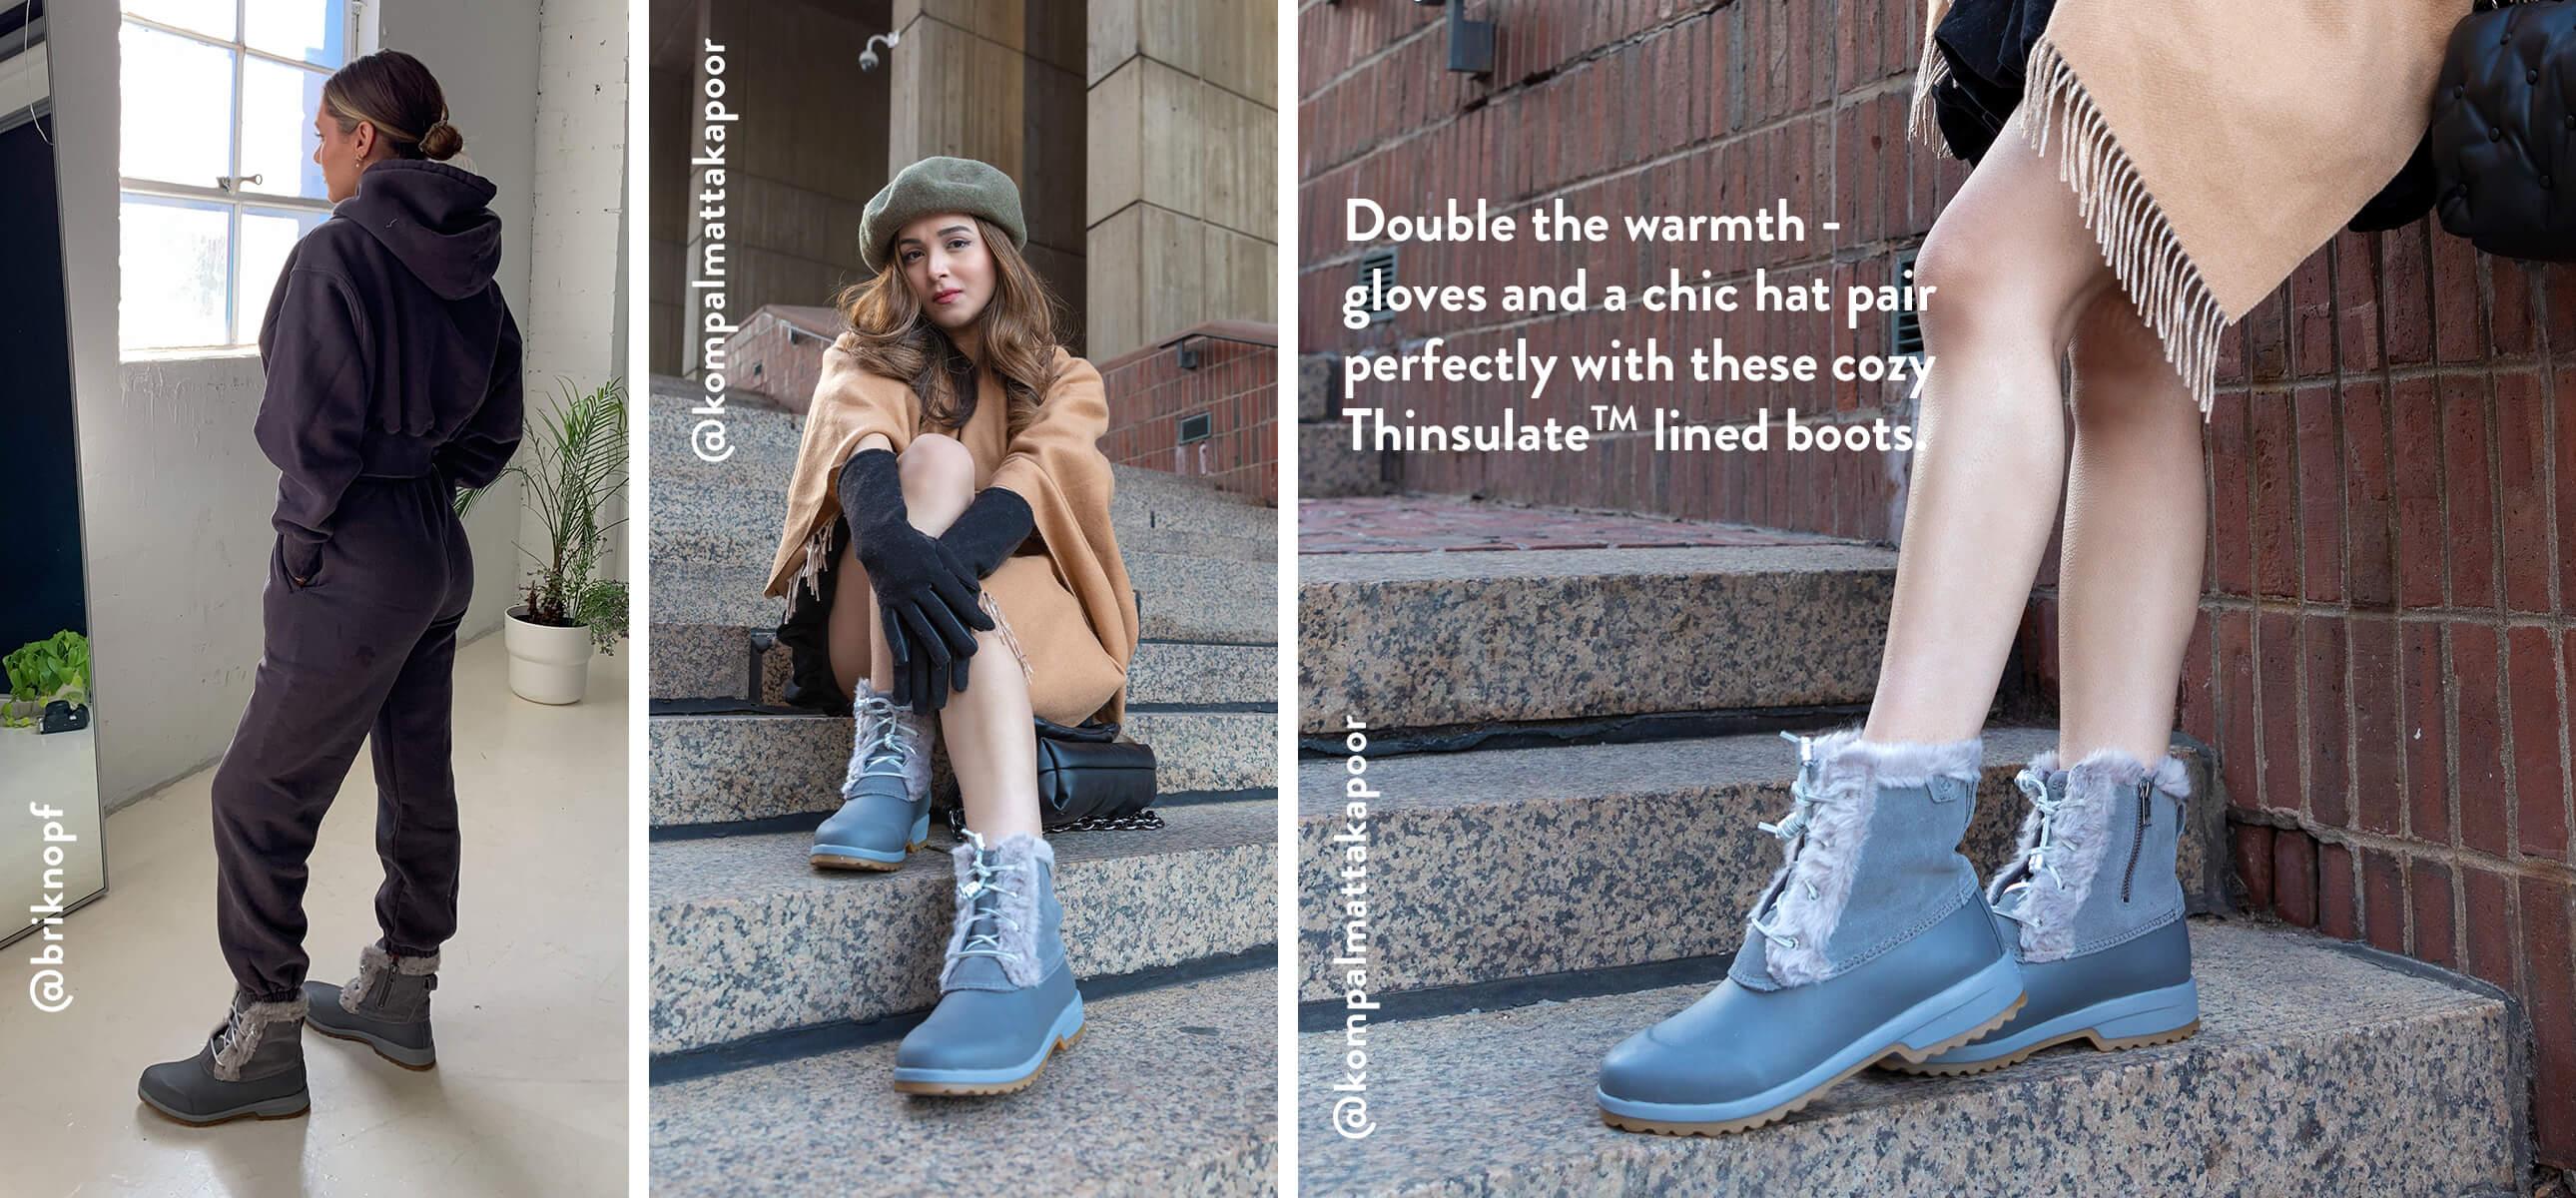 3 girls looking stylish in Sperry boots. @briknopf, @kompalmattakapoor.